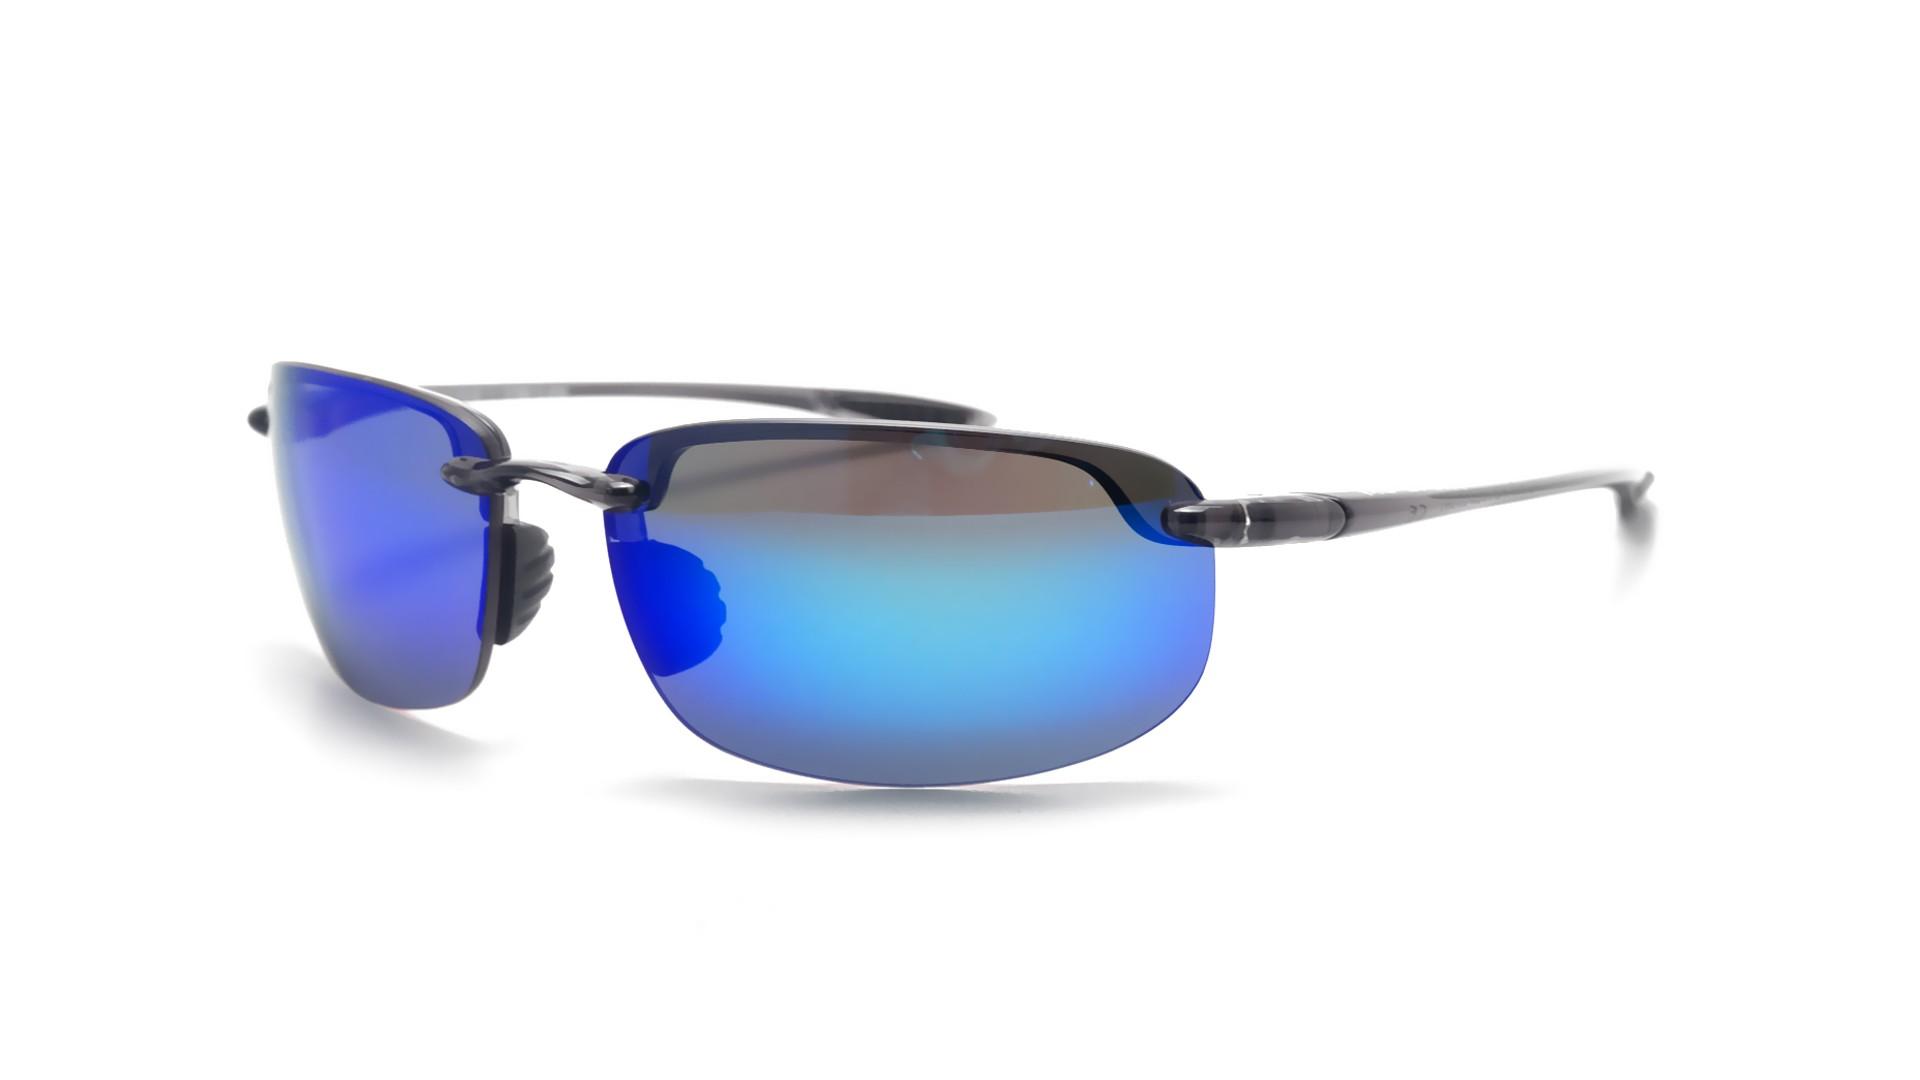 82c43536c02 Sunglasses Maui Jim Ho okipa Grey B407 11 Polarized sunglasses